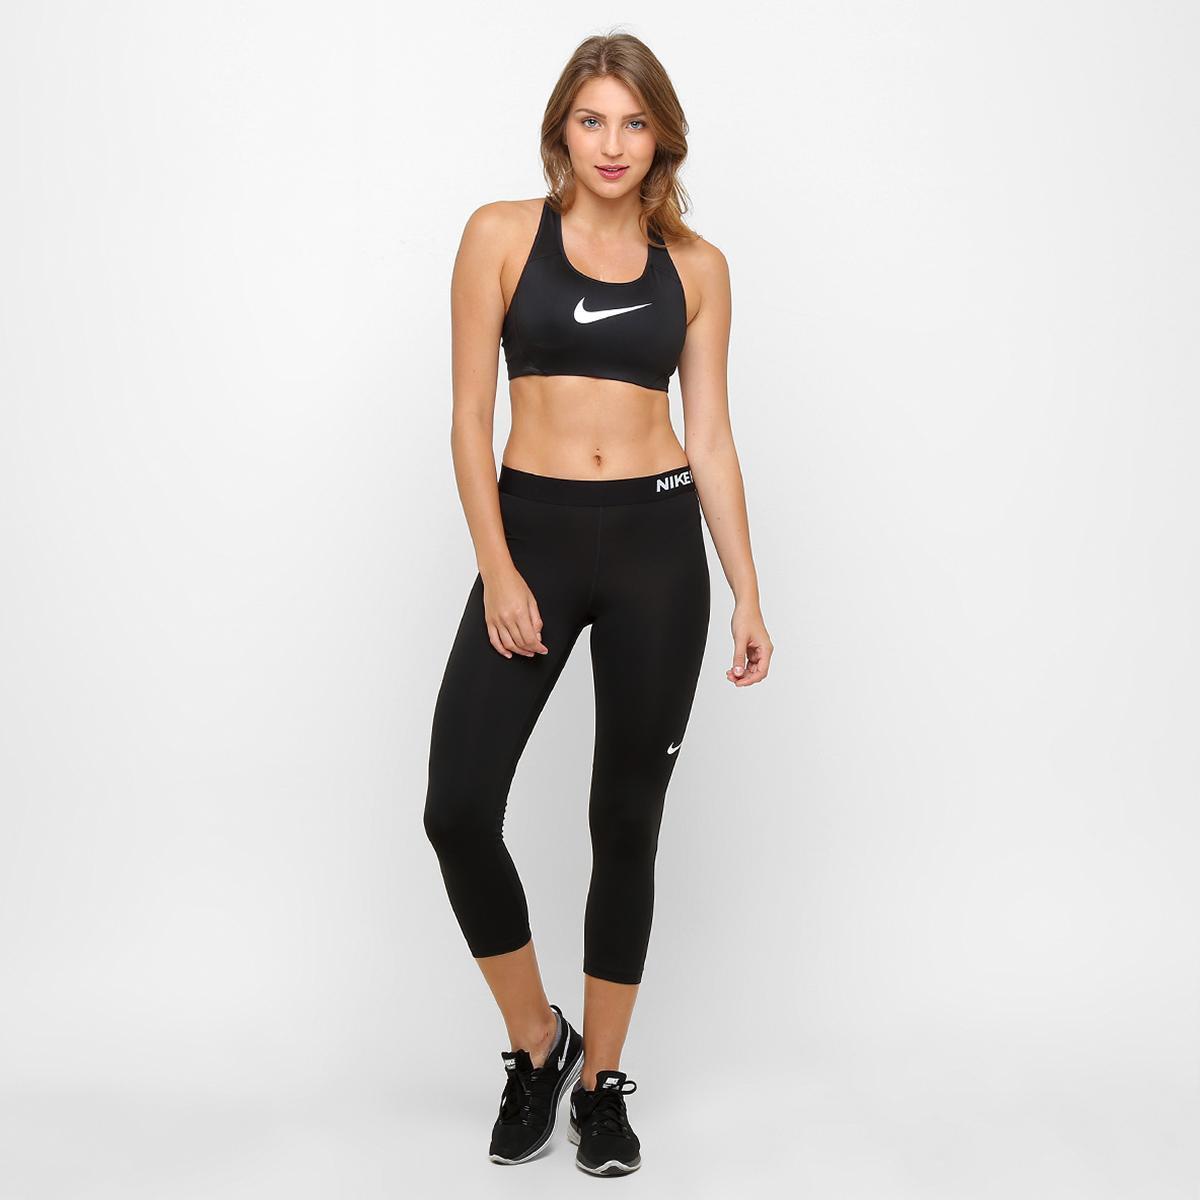 Calça Capri Nike Pro Cool Feminina - Compre Agora  bd9c48f717ac4